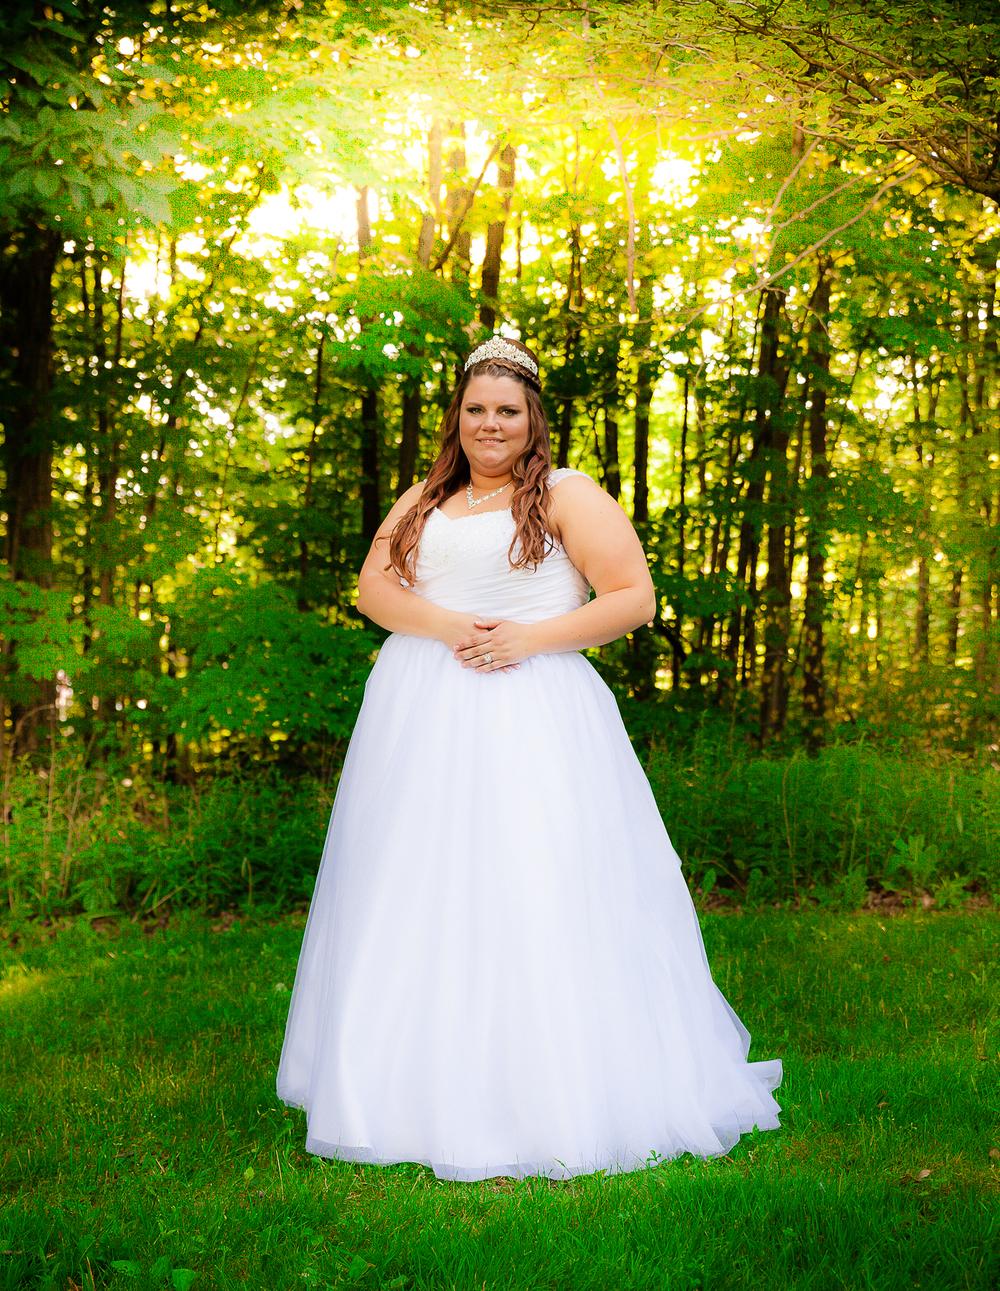 jenna + tony wedding blog (68 of 112).jpg